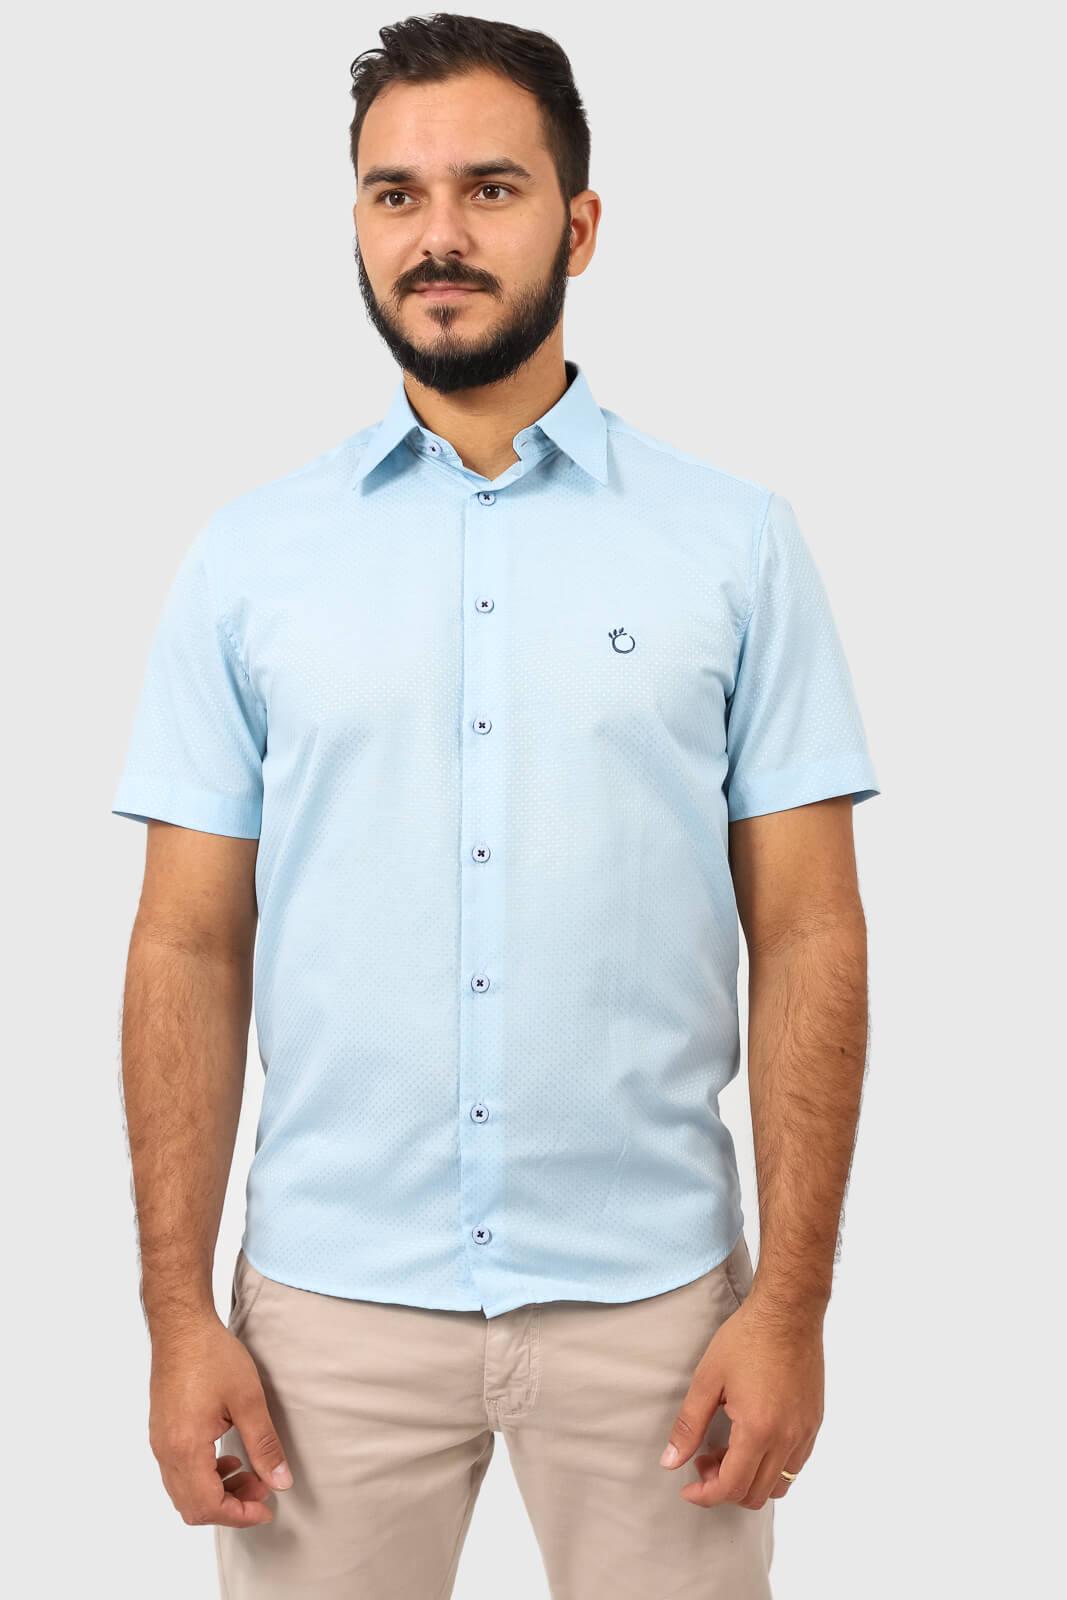 Camisa Social Masculina Olimpo Maquinetada Poá Manga Curta